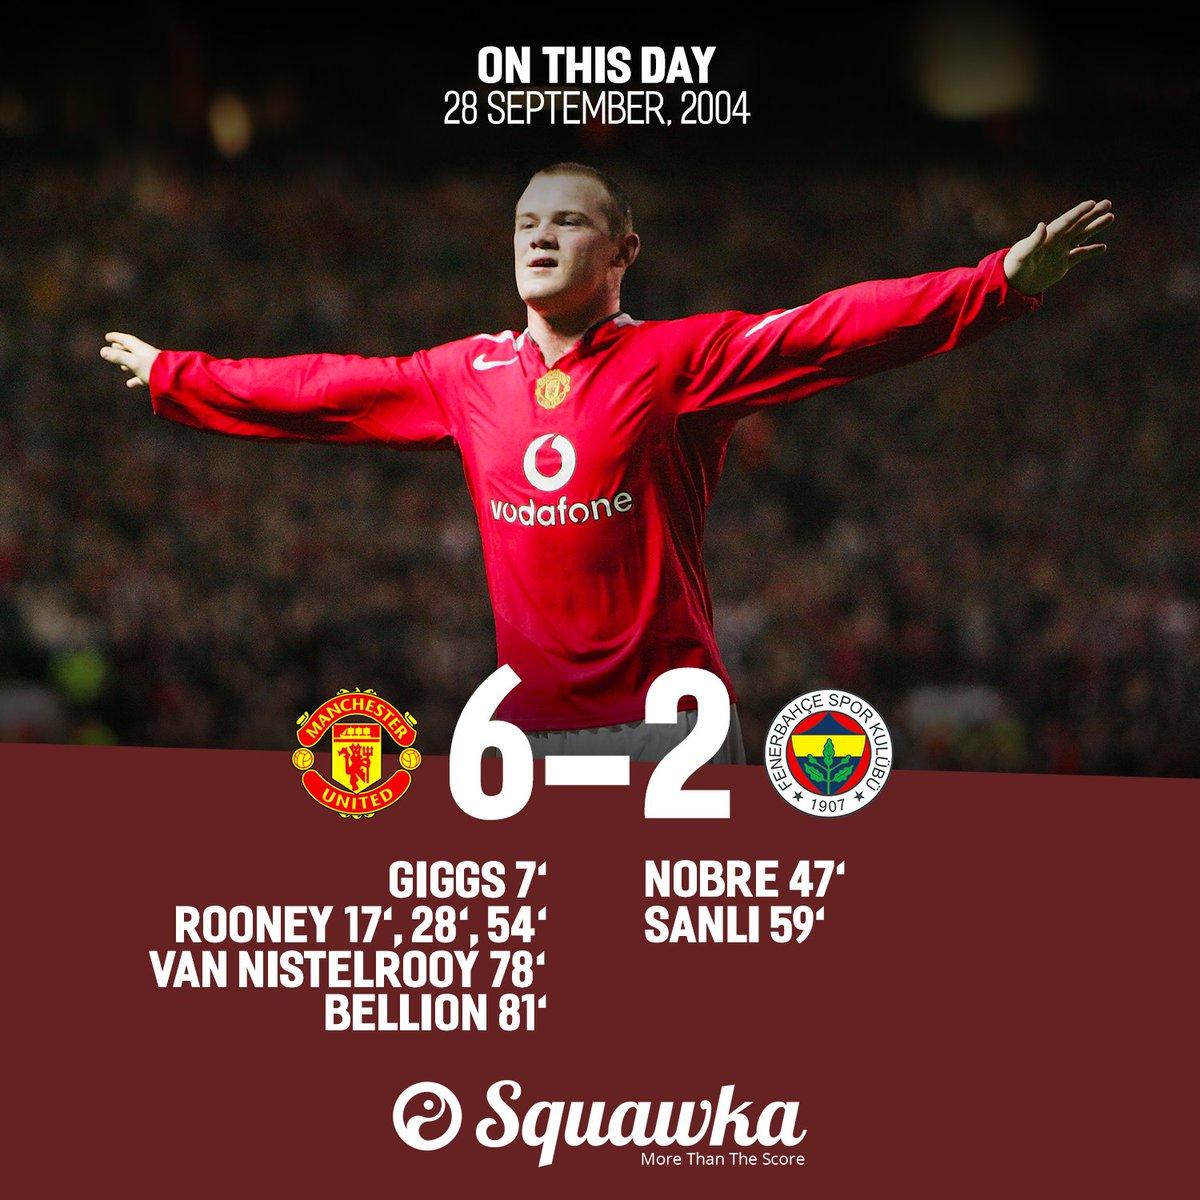 Squawka Football On Twitter 28th September 2004 Wayne Rooney Scores His First European Goal 28th September 2017 Wayne Rooney Scores His 40th European Goal Https T Co Fqqv3cjcir